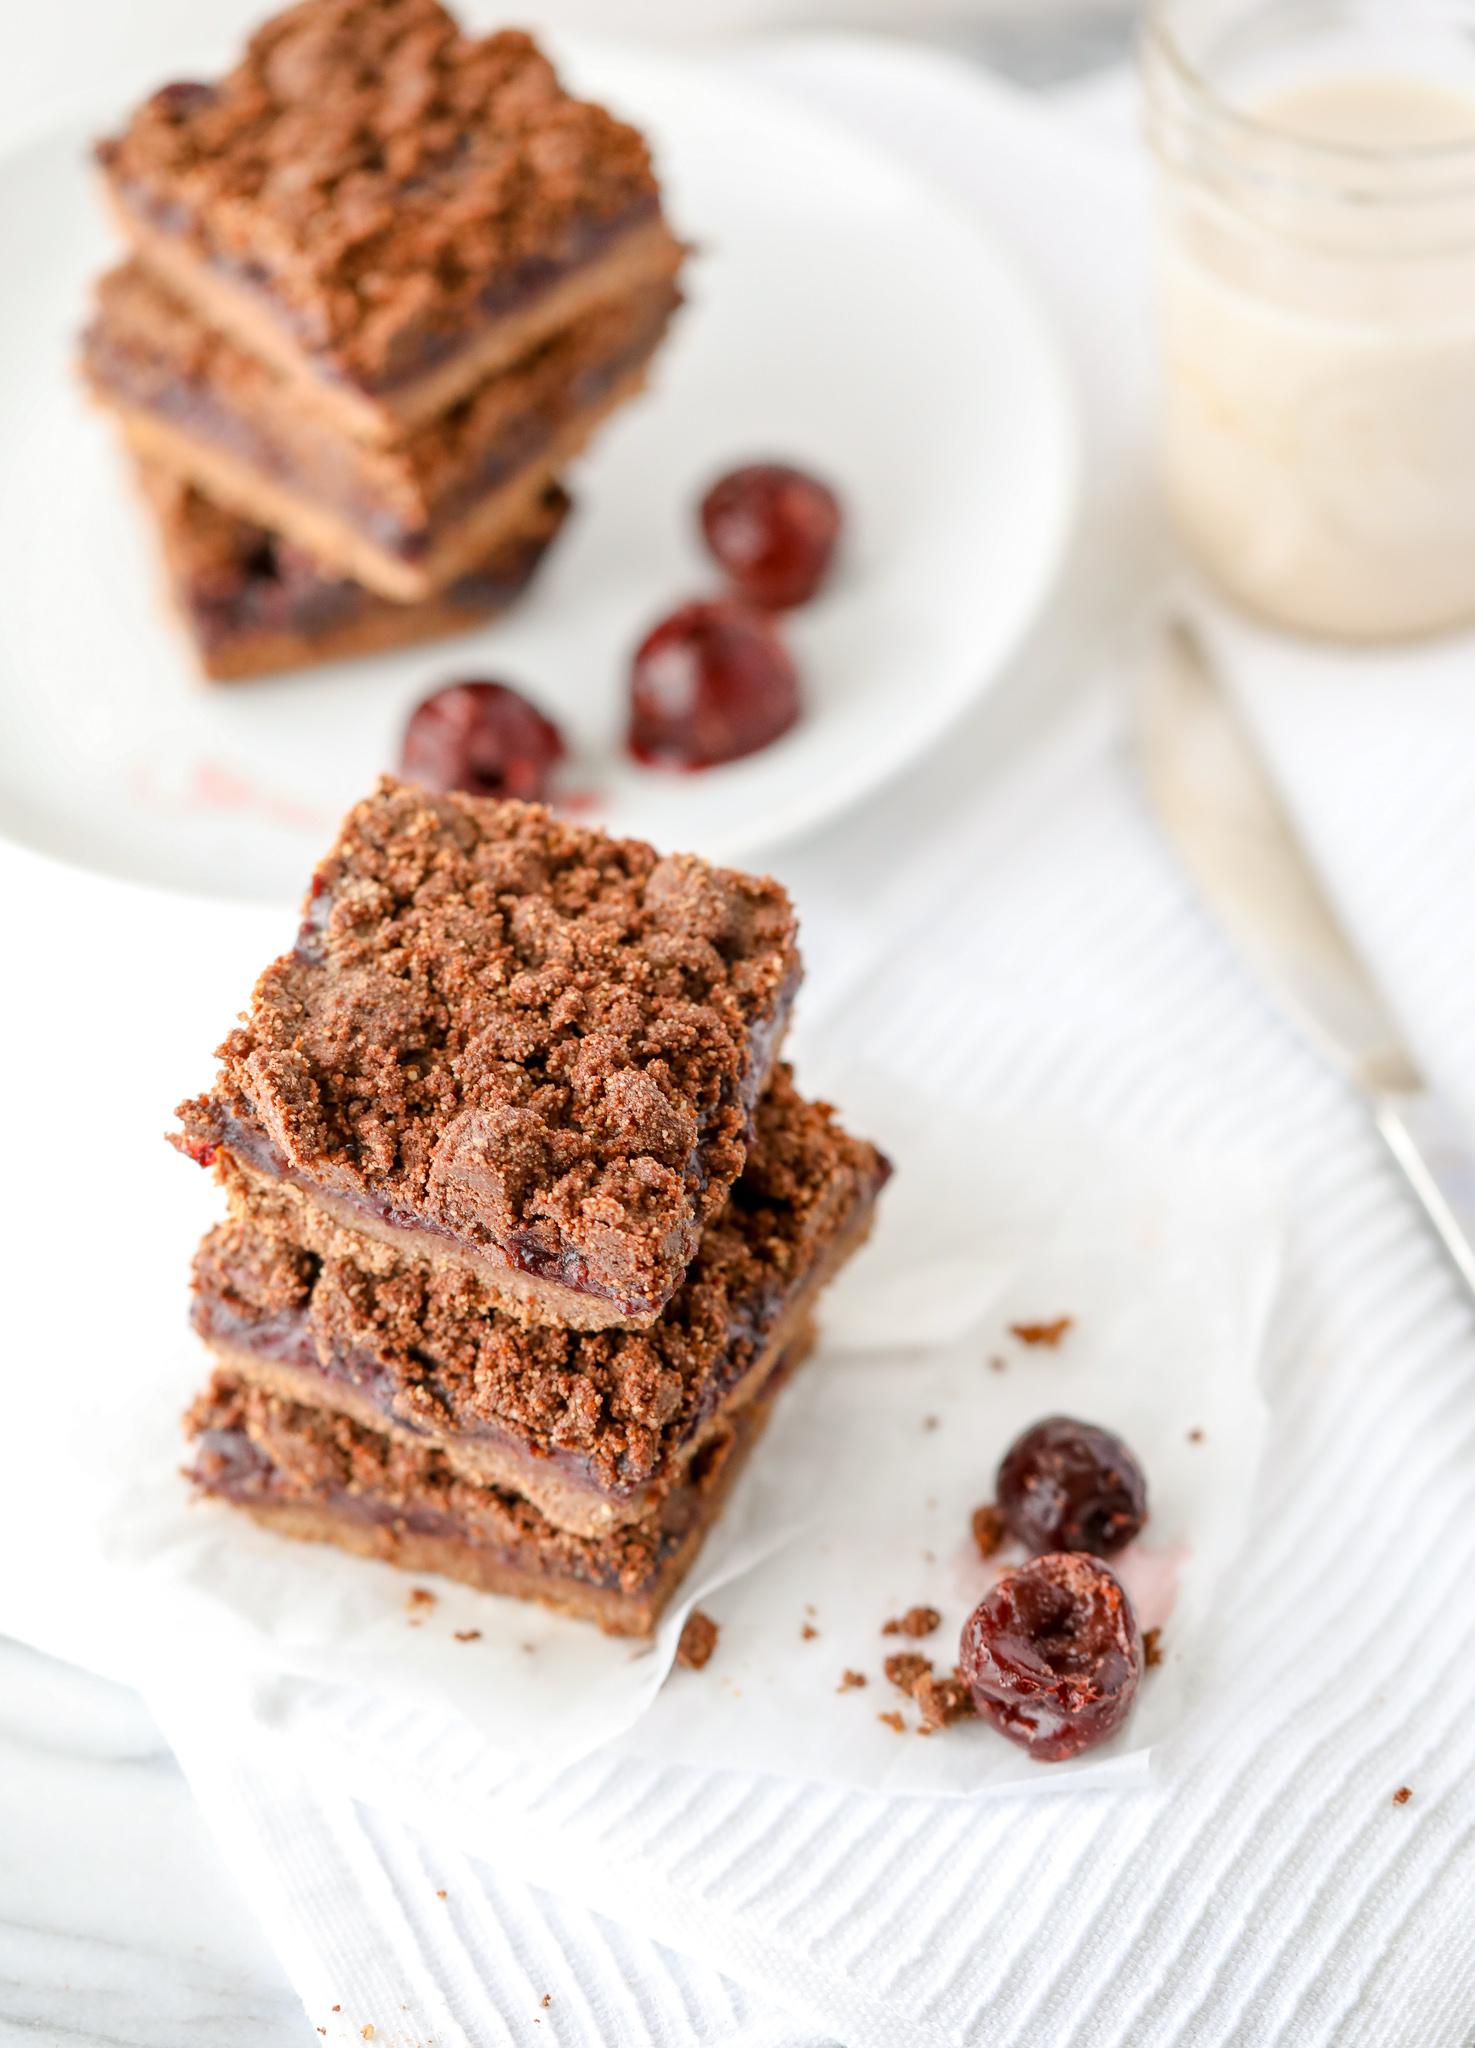 Healthy Chocolate-Cherry Crumble Bars (Grain-free, Dairy-free)